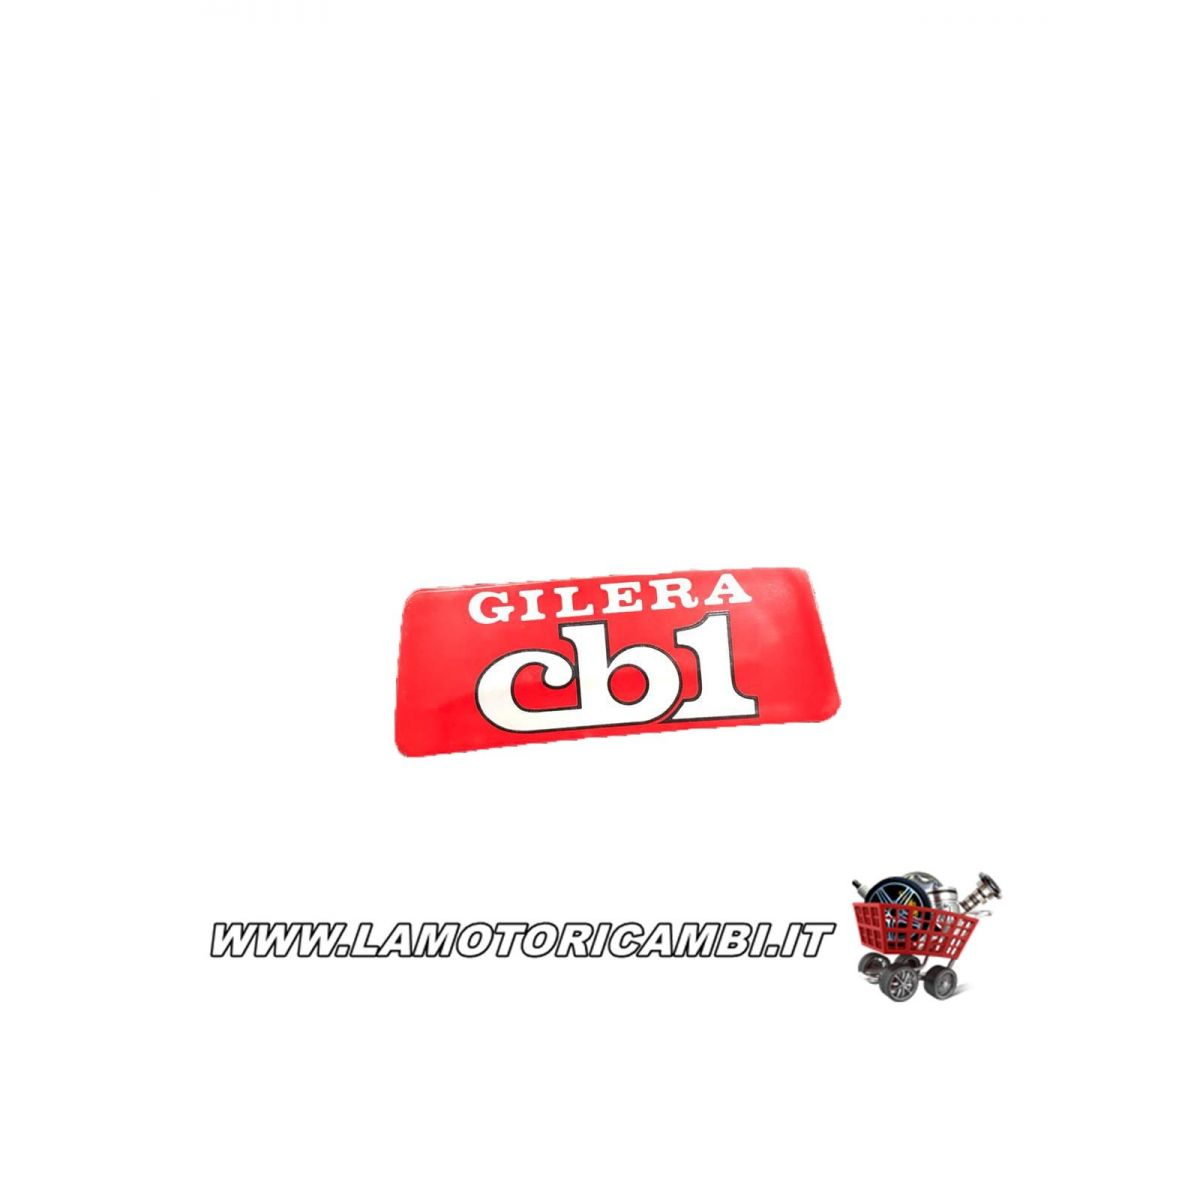 Targhetta gilera cb1 LIMITED EDITION